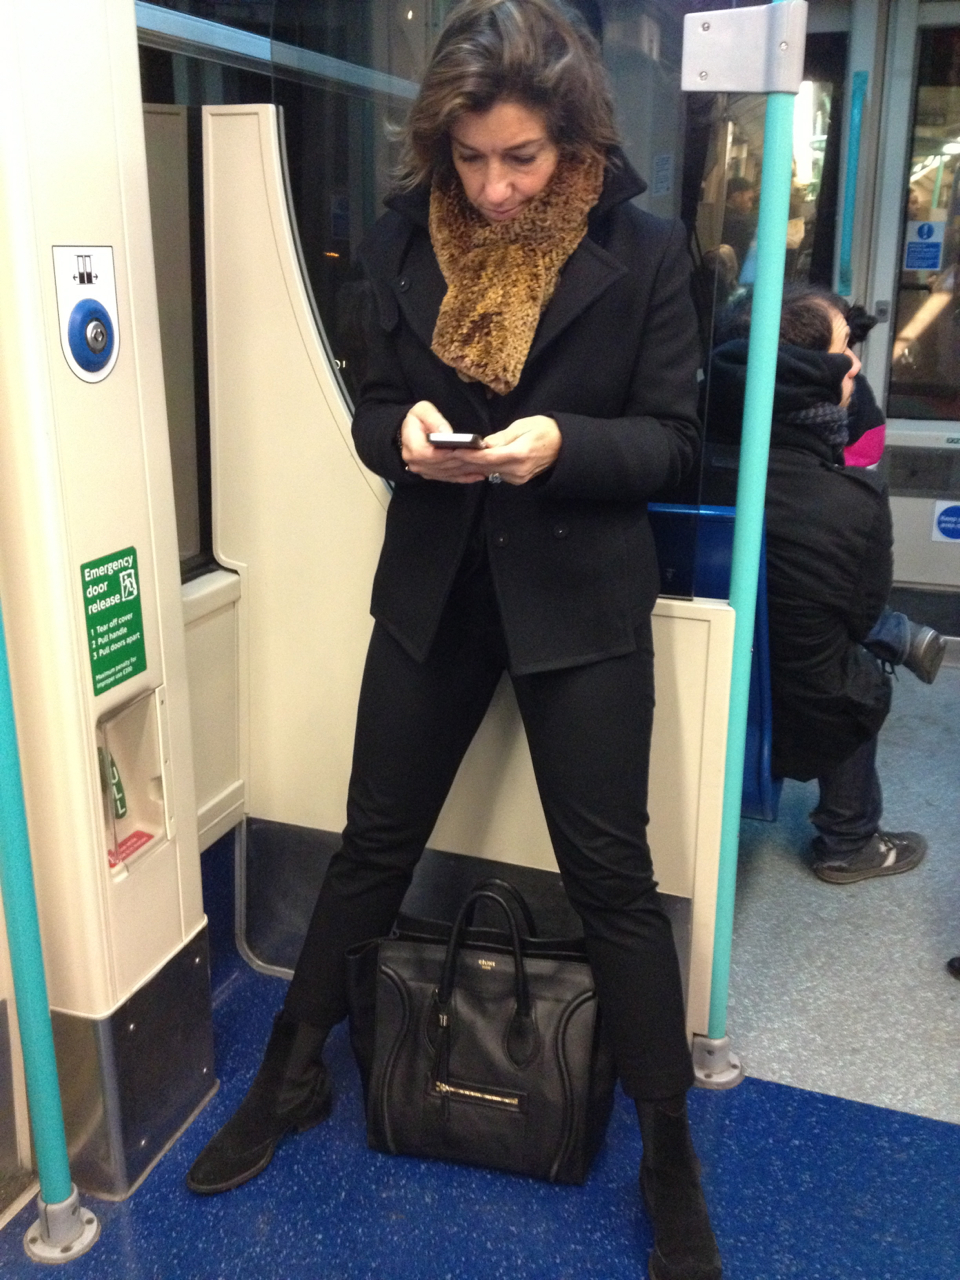 Na volta no metrô, já postando no Instagram...